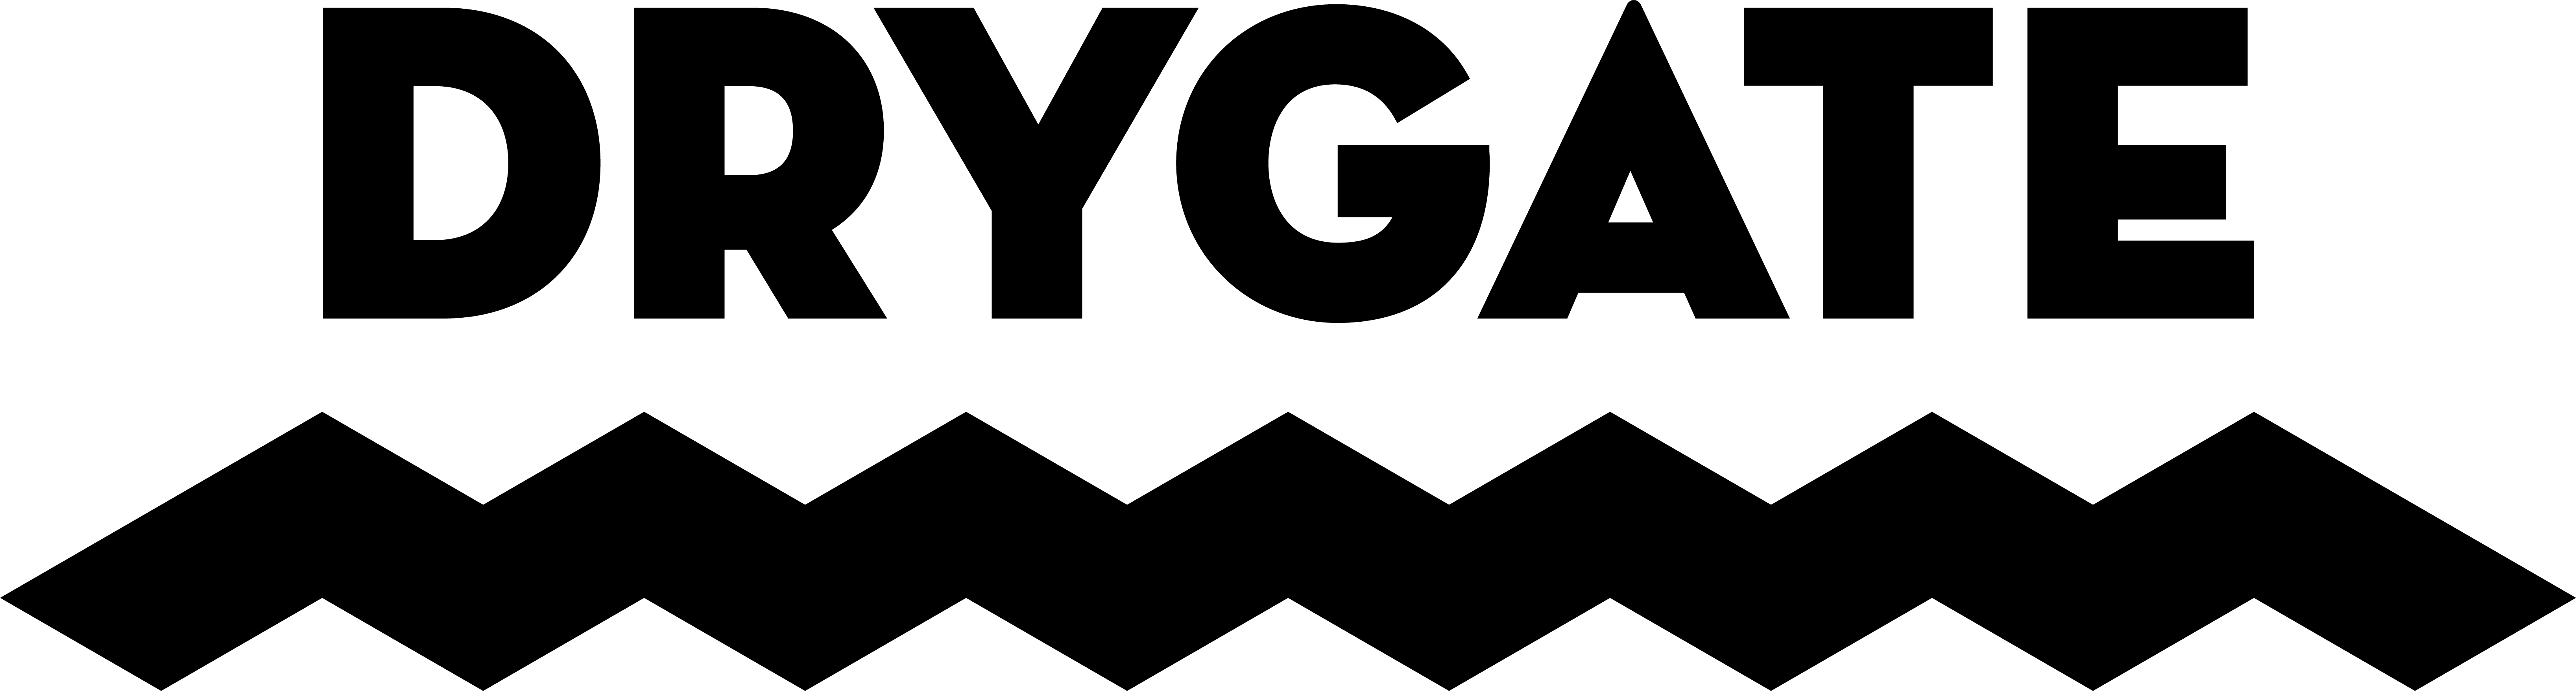 Drygate Logotype Black 21